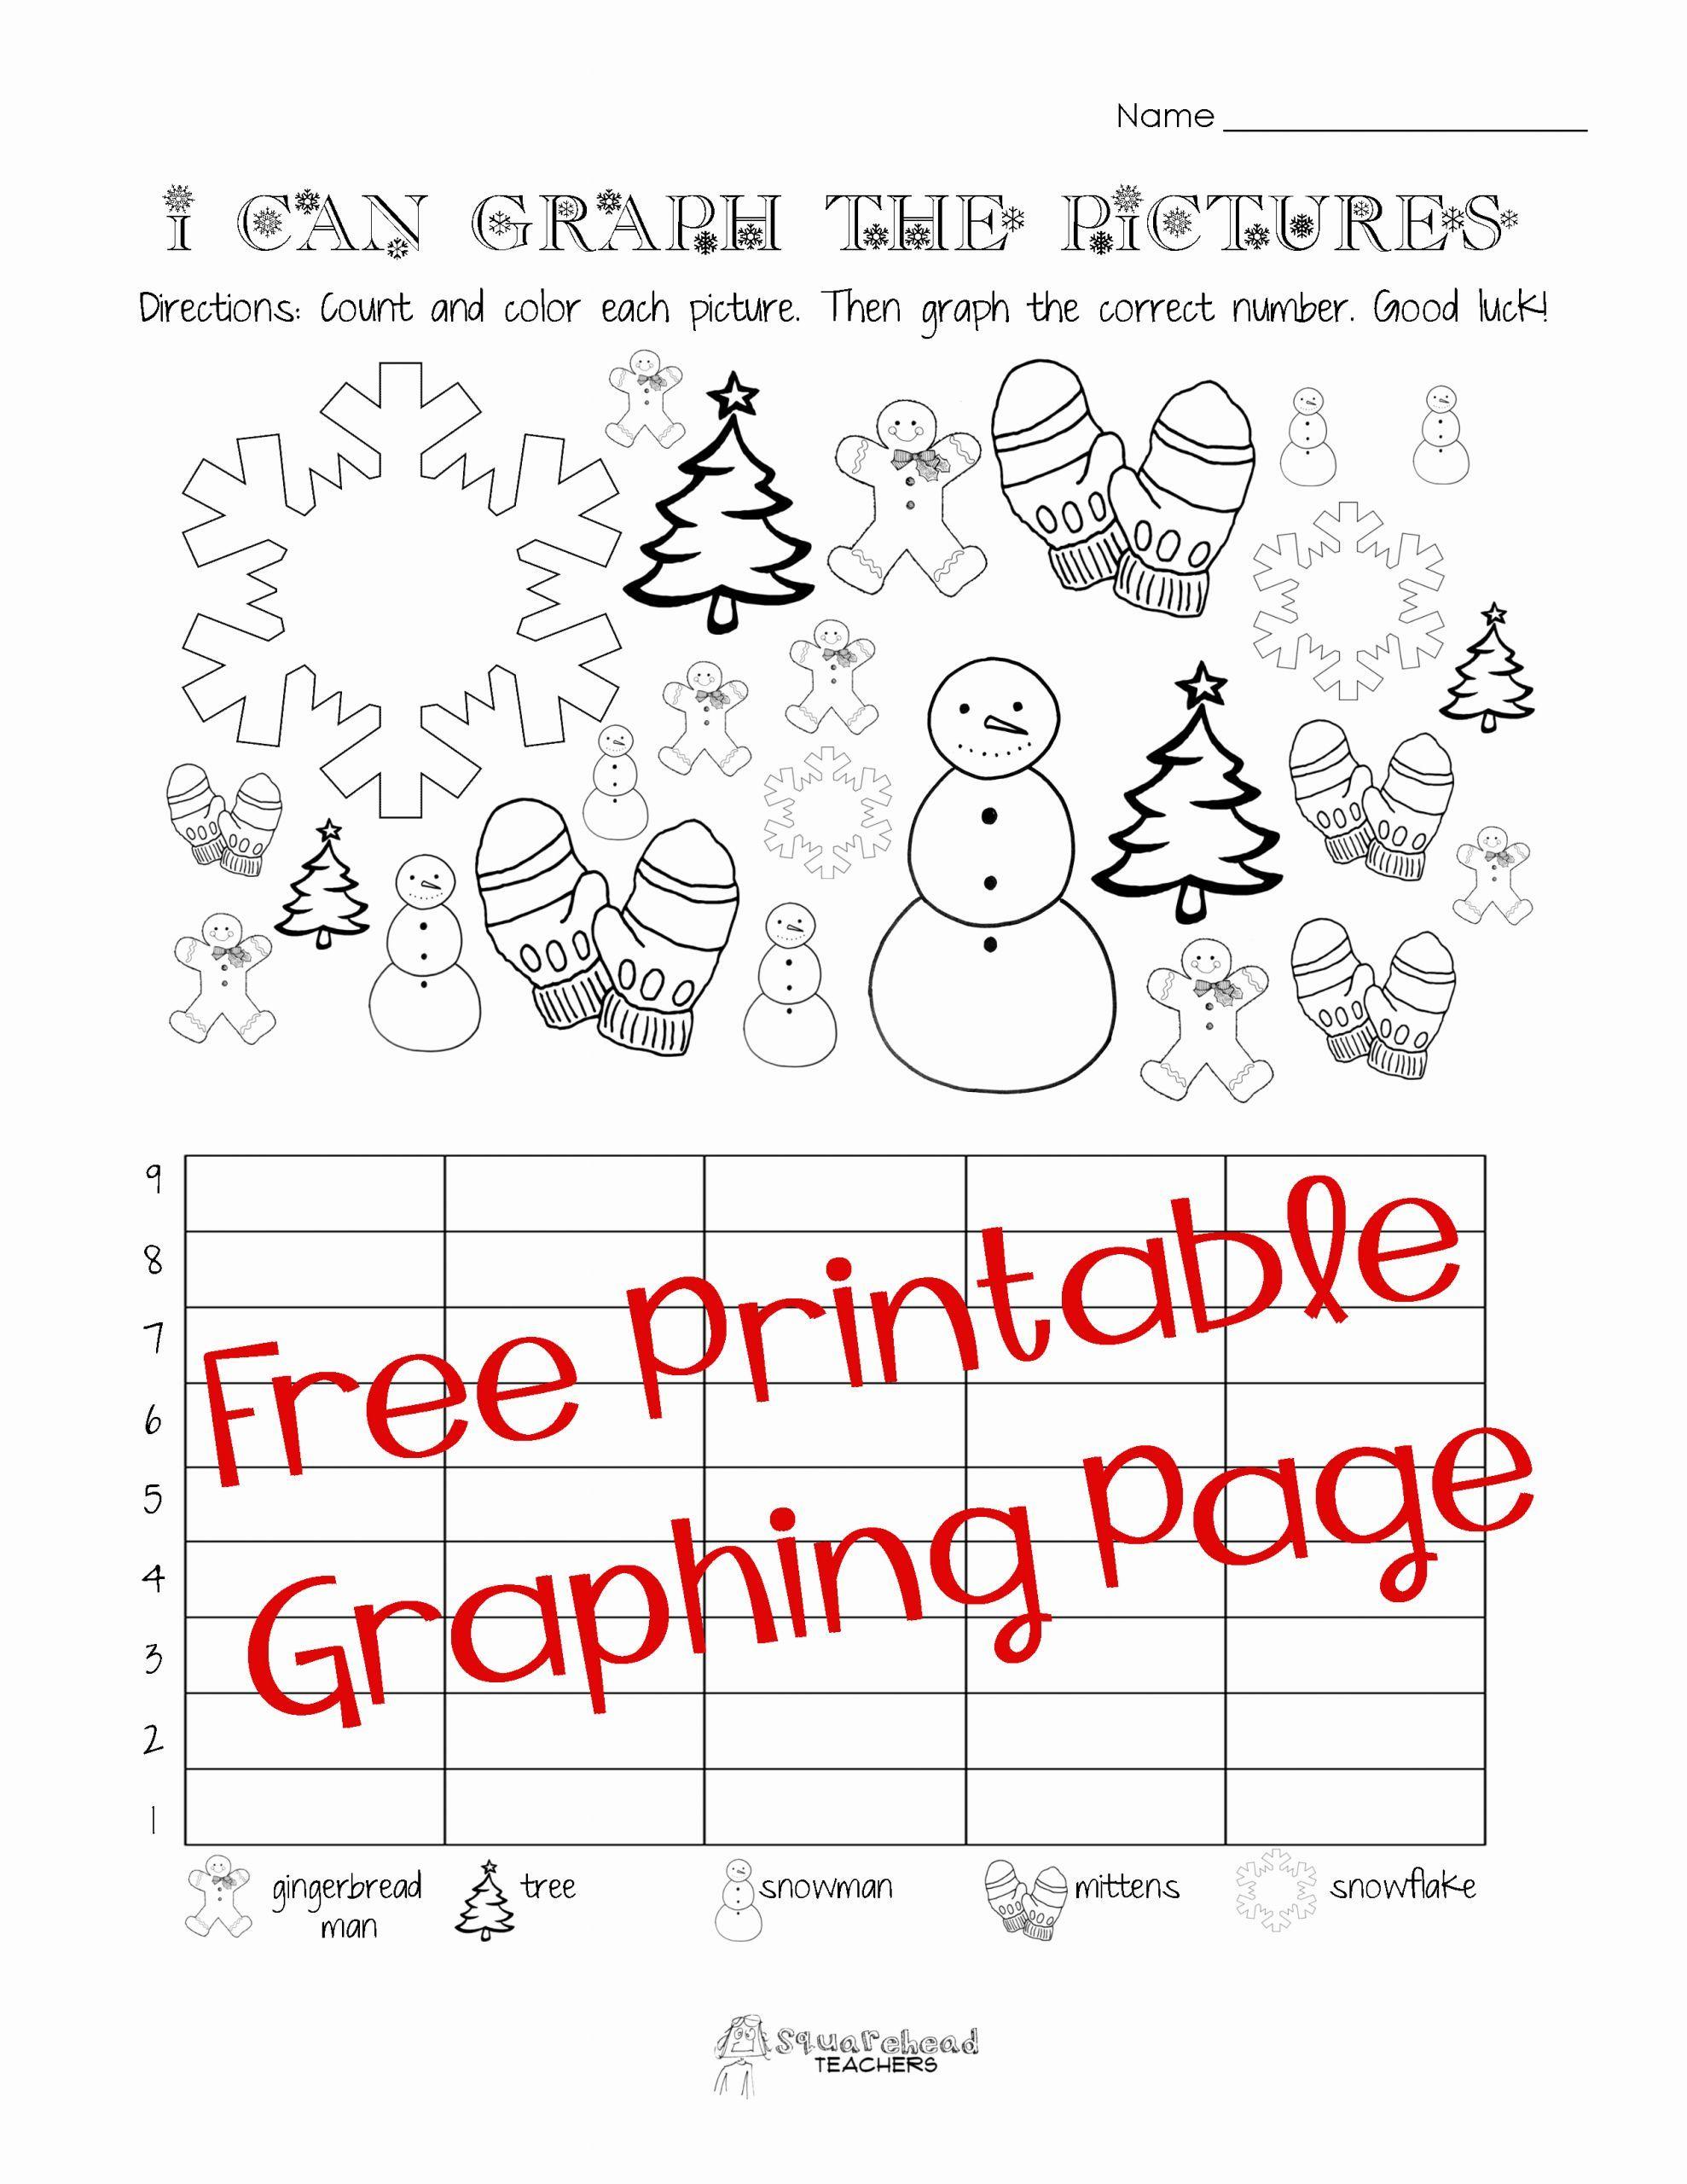 Graphing Worksheet Kindergarten Free Christmas Math Worksheets Christmas Worksheets Kindergarten Christmas Worksheets